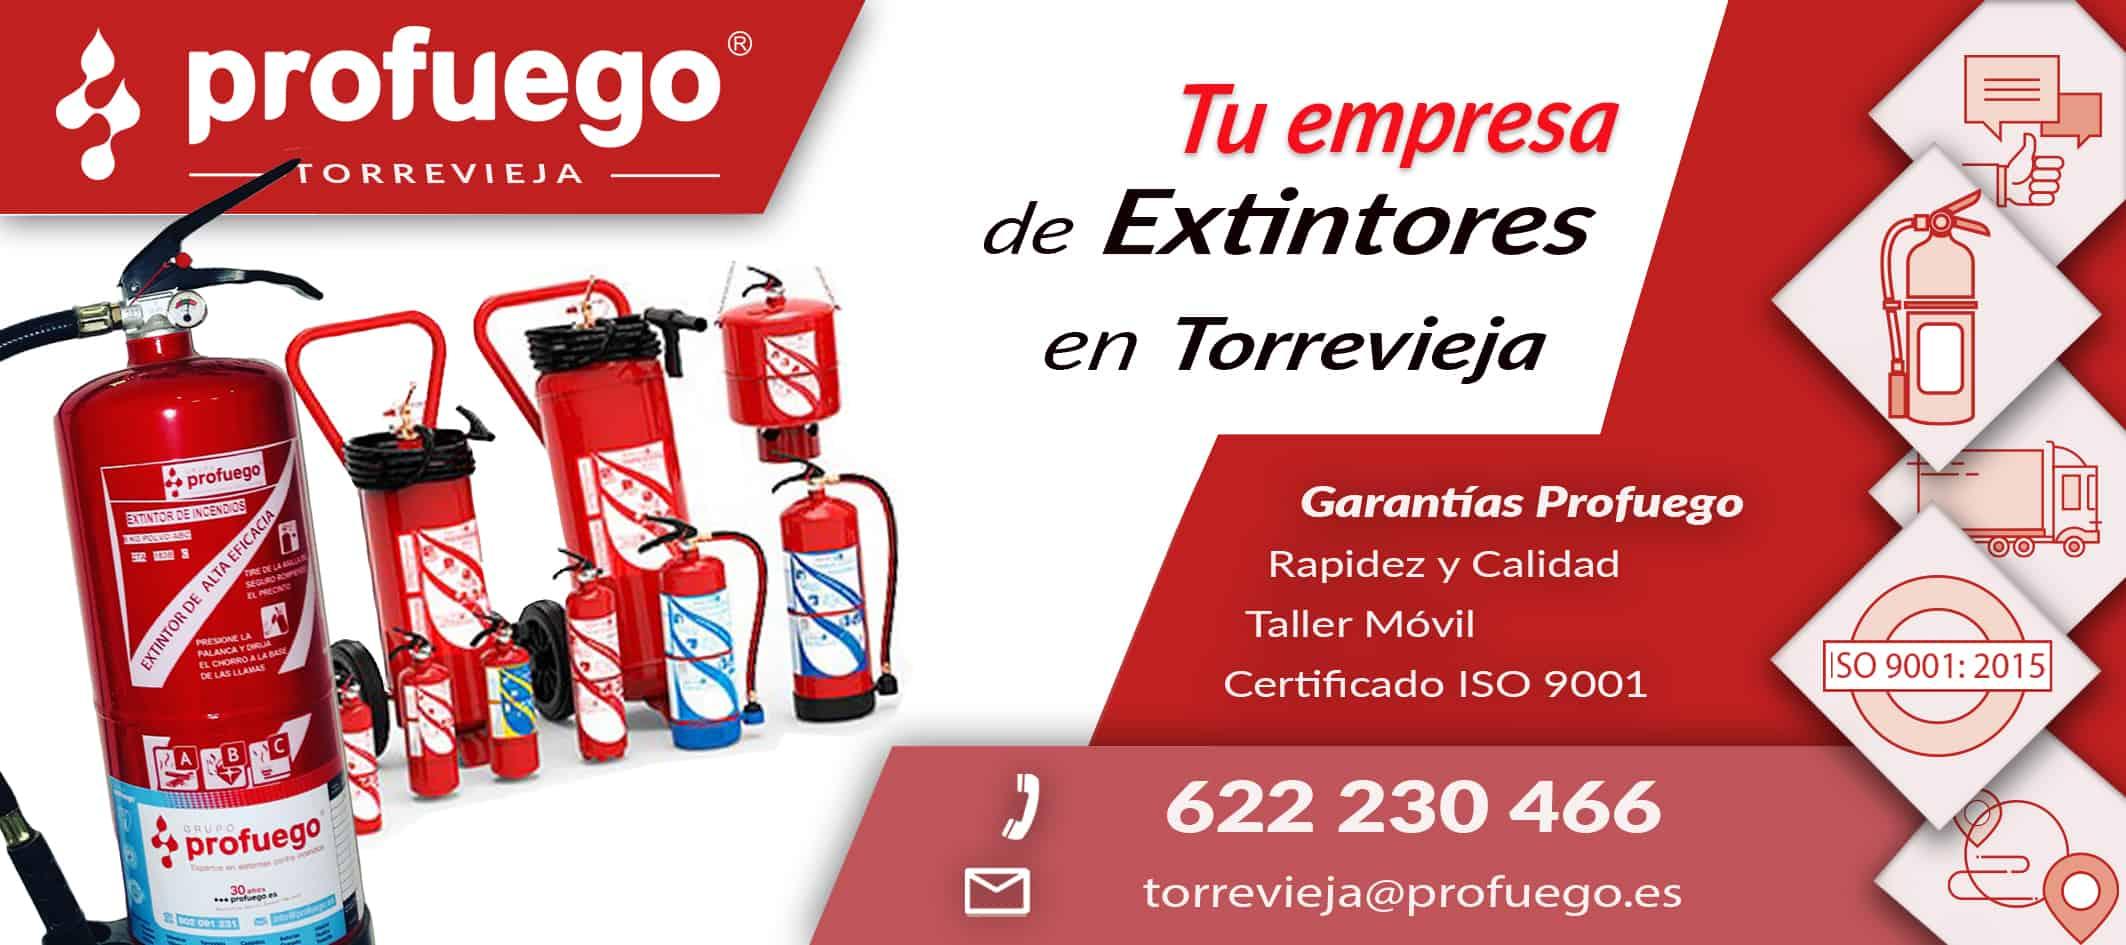 extintores torrevieja